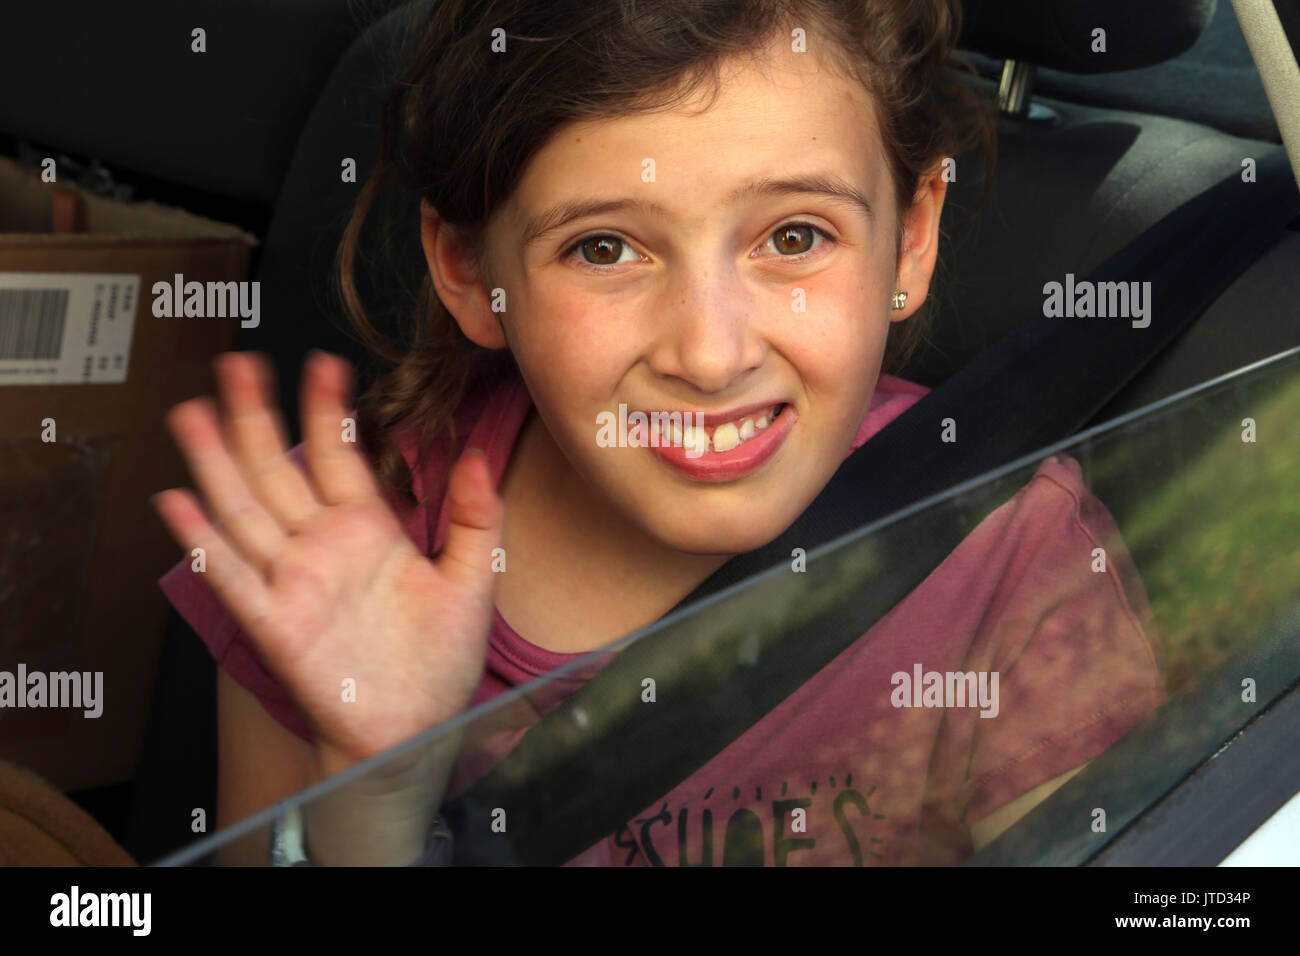 Young girl in car waving goodbye Surrey England - Stock Image